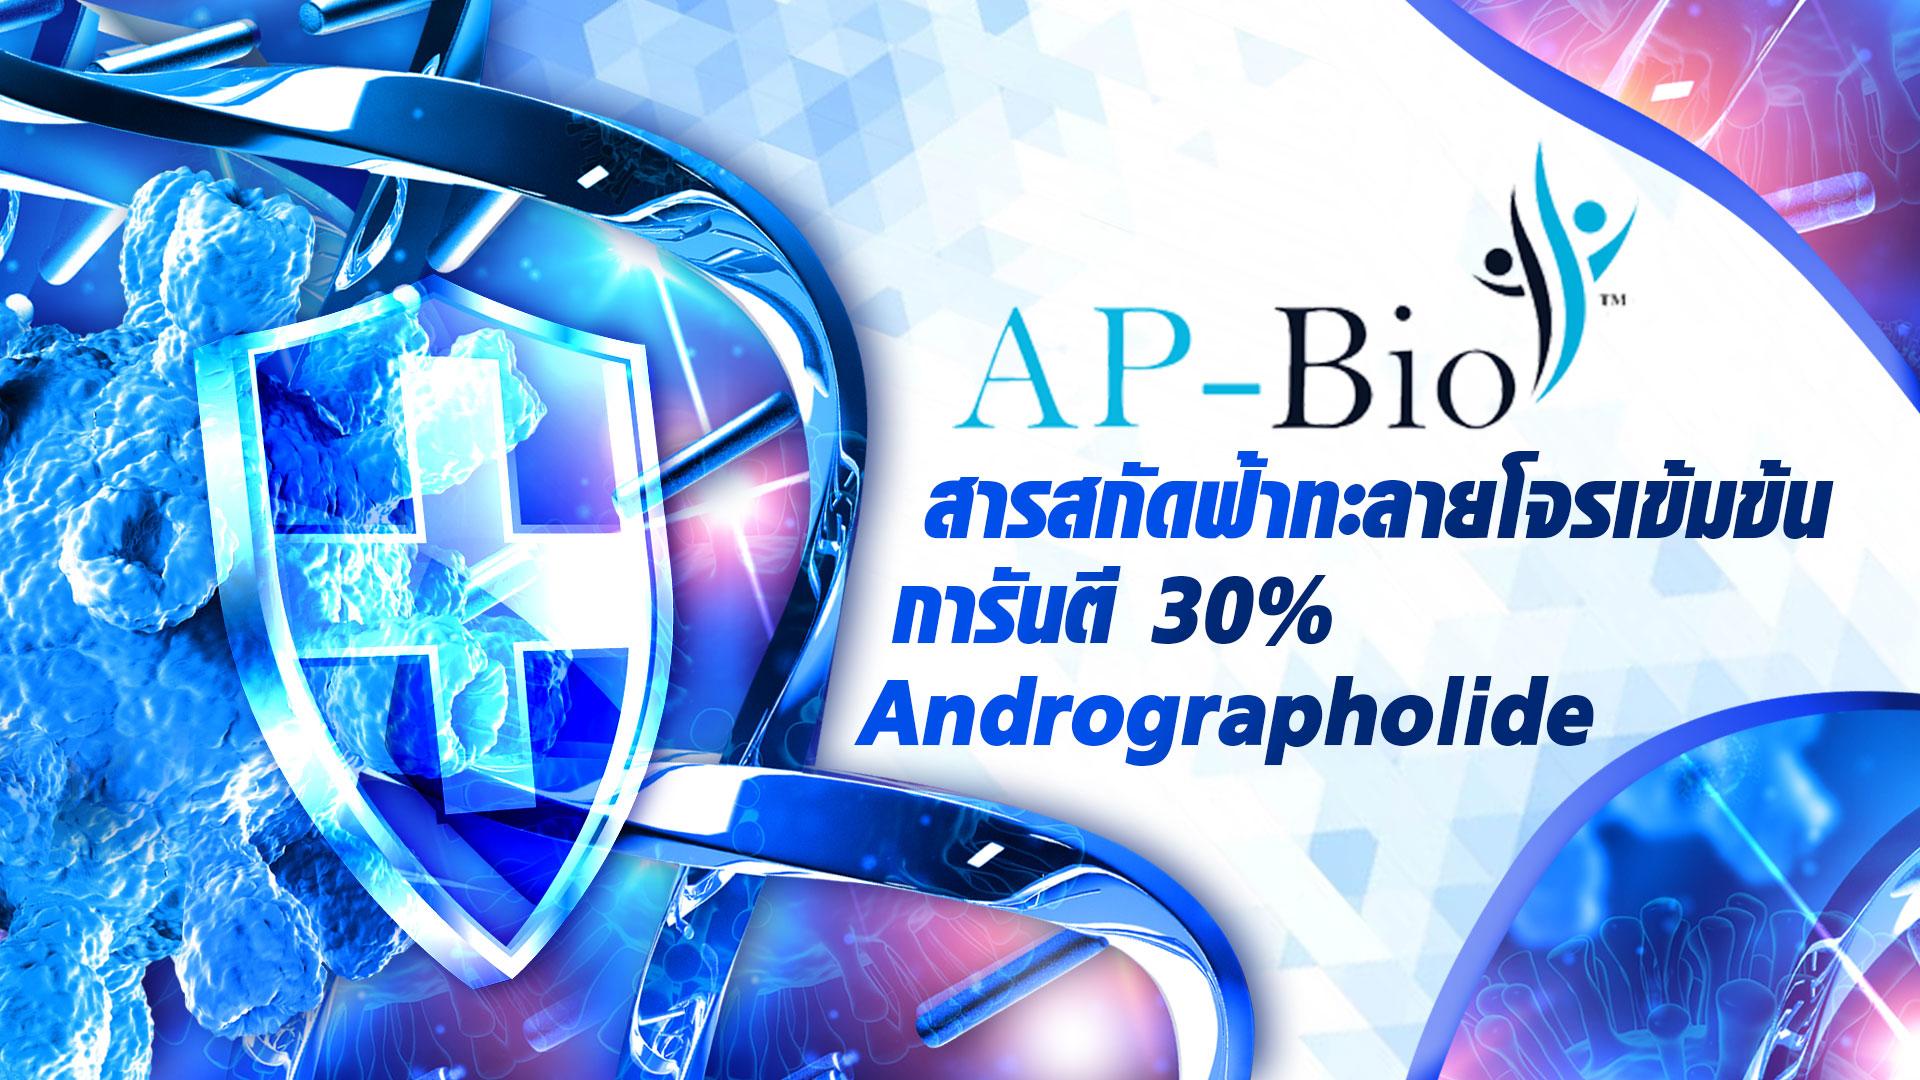 AP-Bio สารสกัดฟ้าทะลายโจรเข้มข้น การันตี 30% Andrographolide